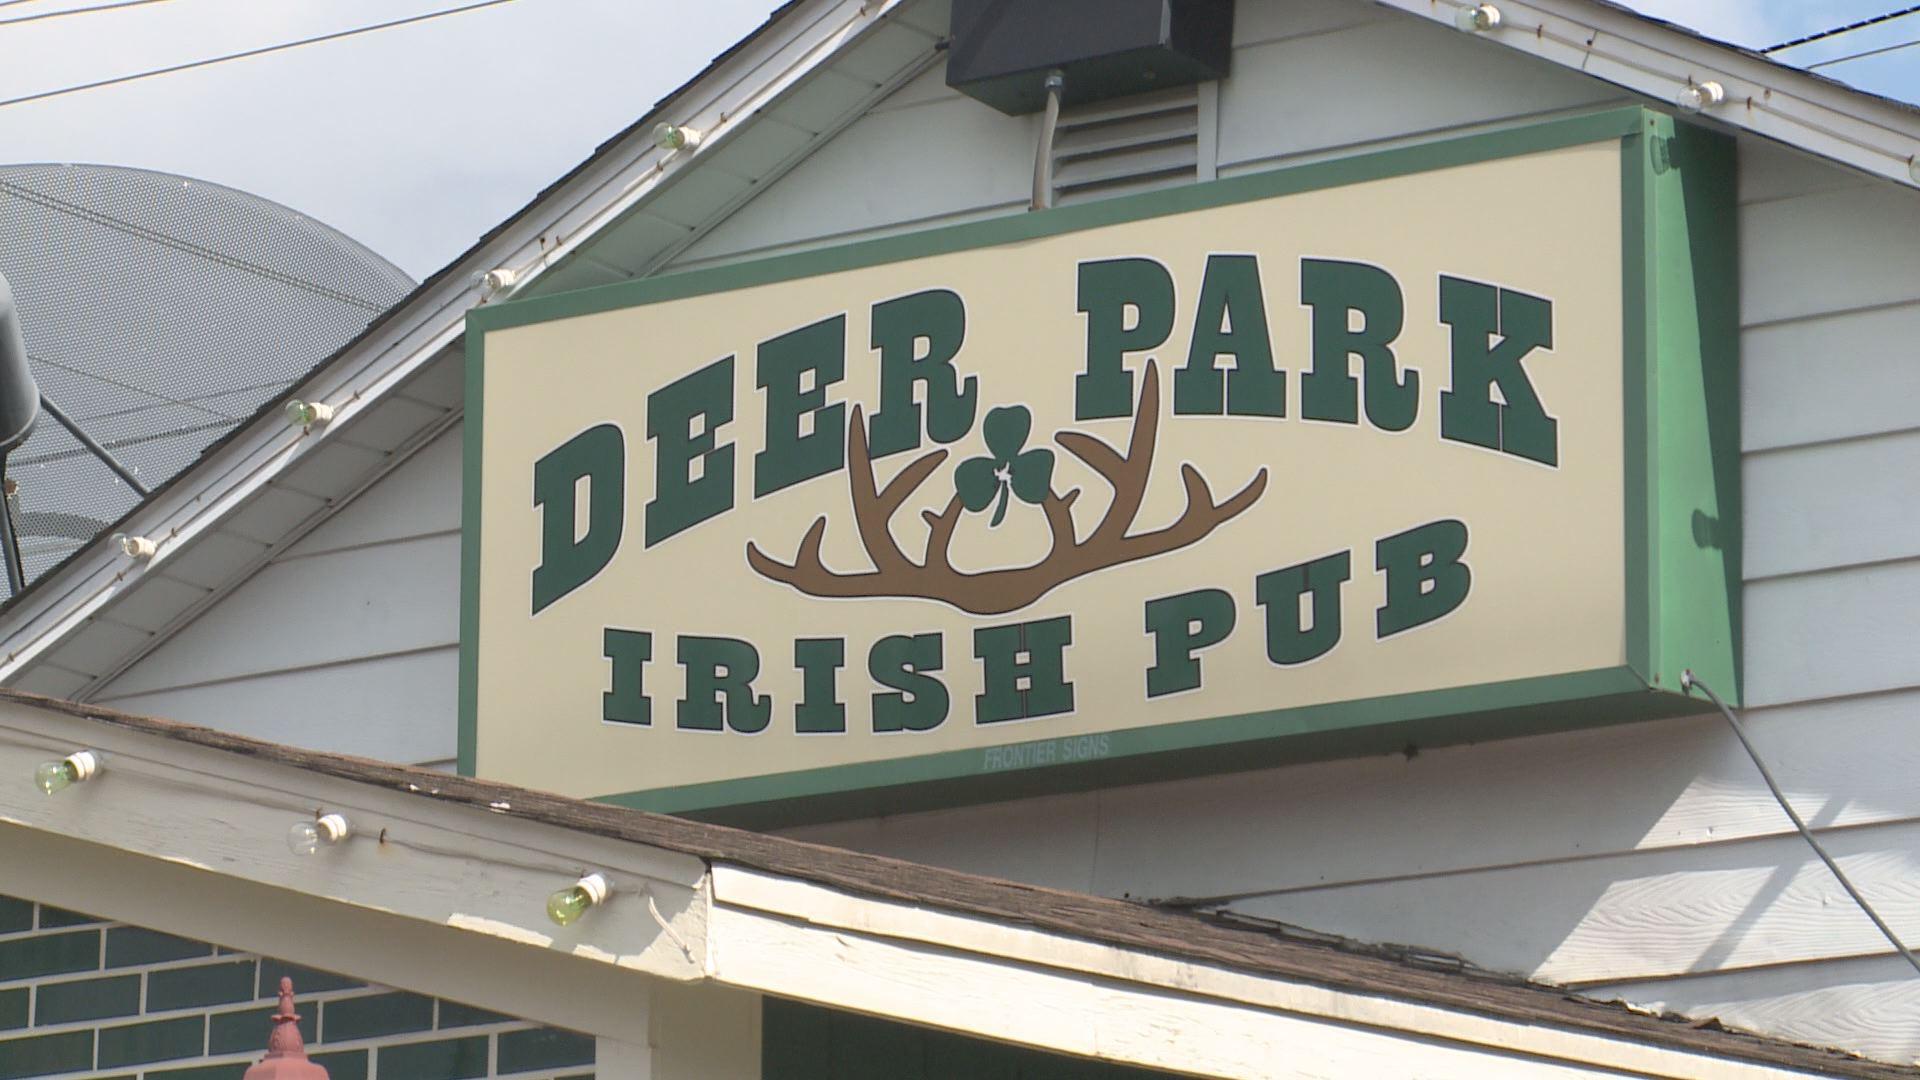 deer park irish pub_1551486022461.jpg.jpg